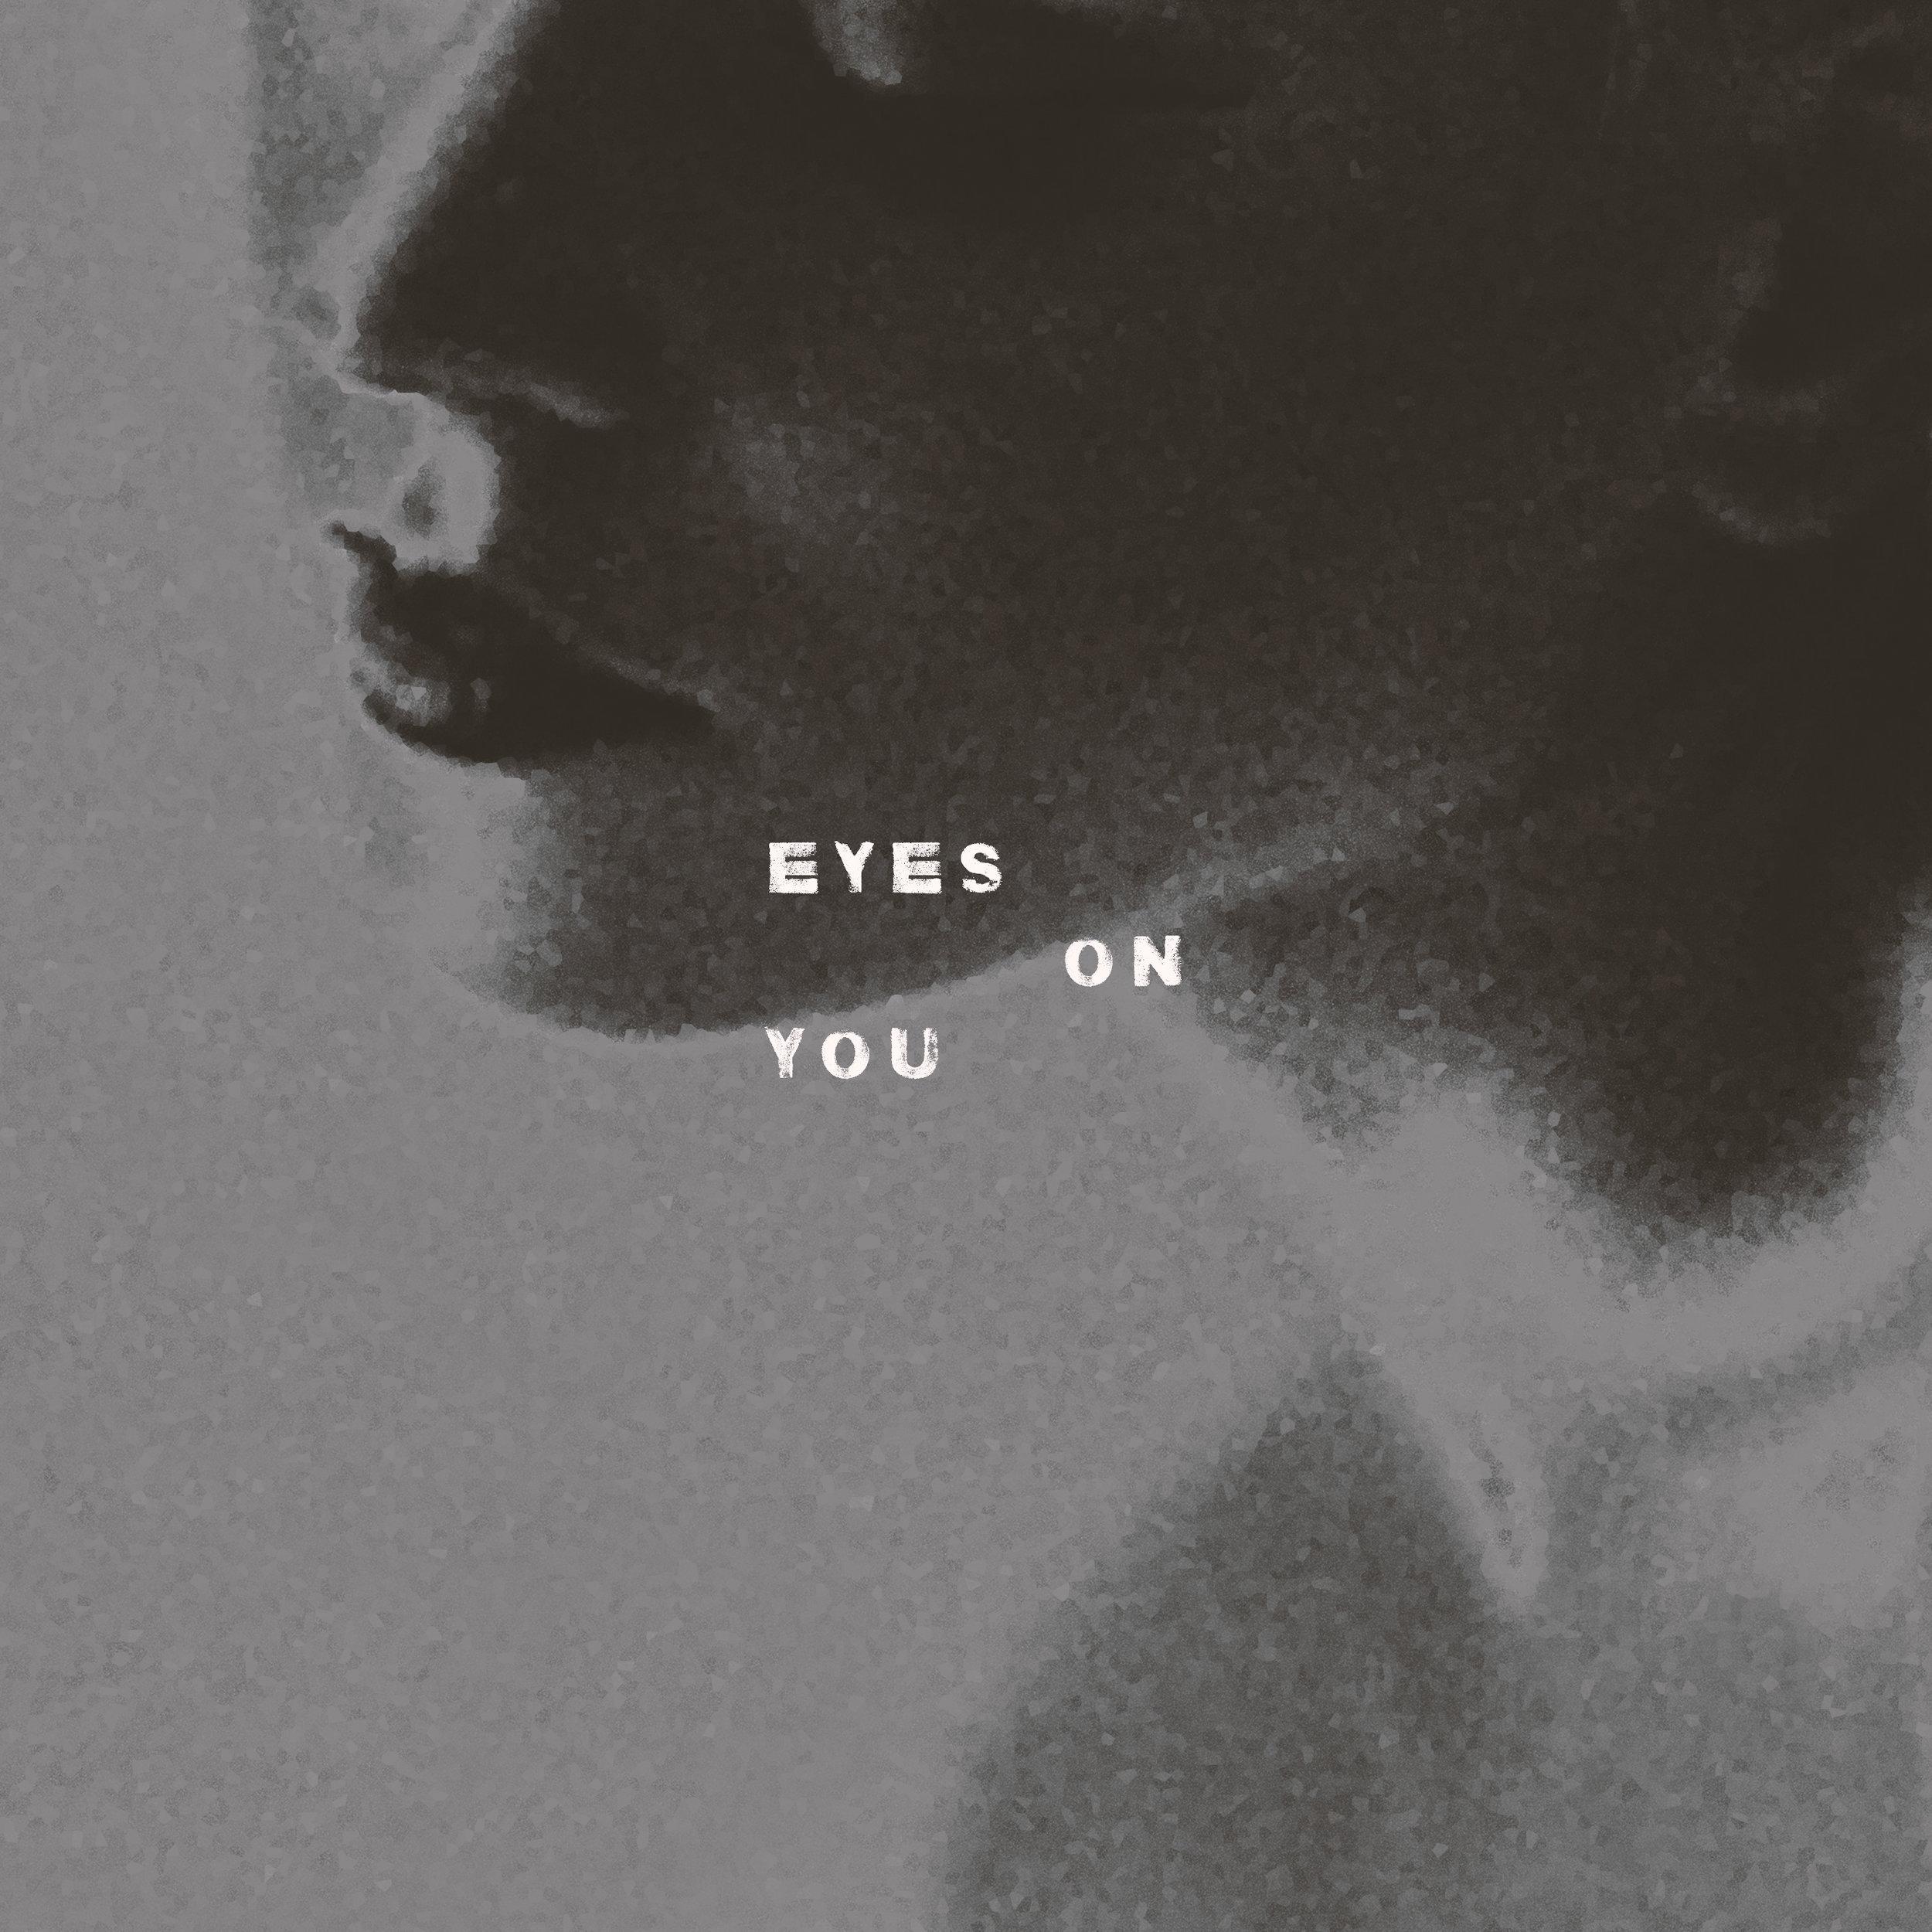 3 One Oh - Eyes On You Album Art - 2660.jpg